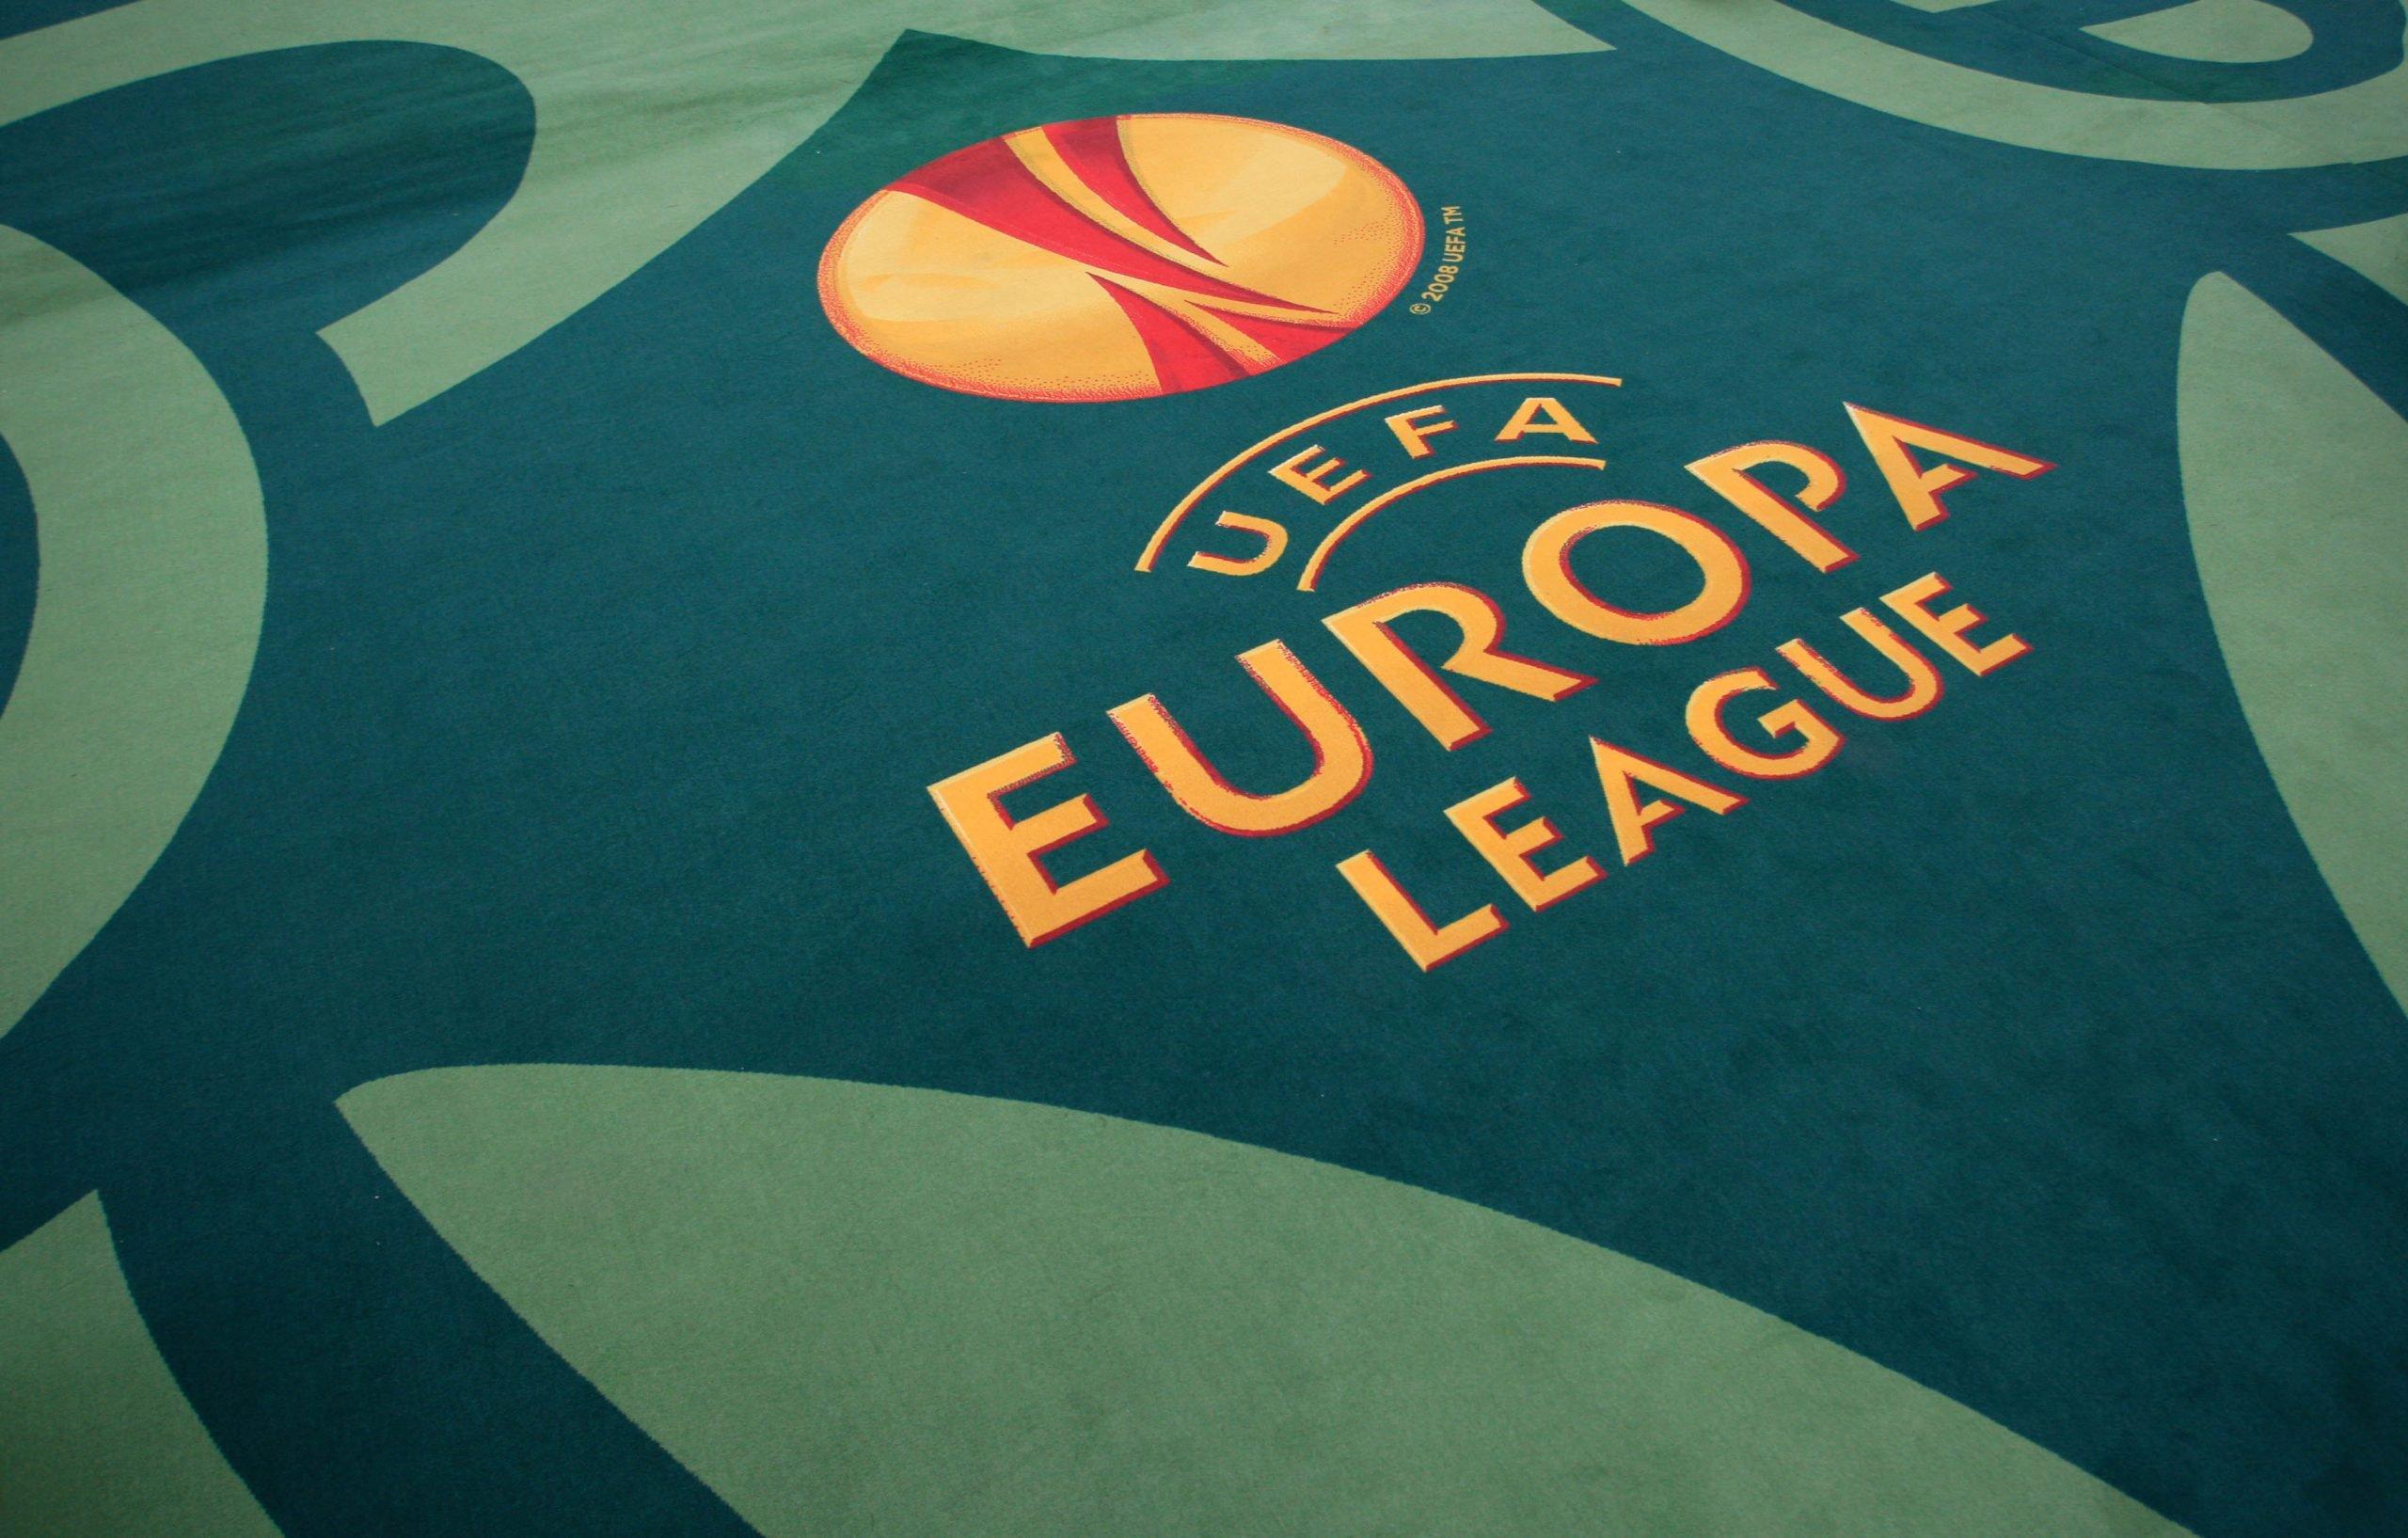 europa league sextondelsfinaler tips odds scaled